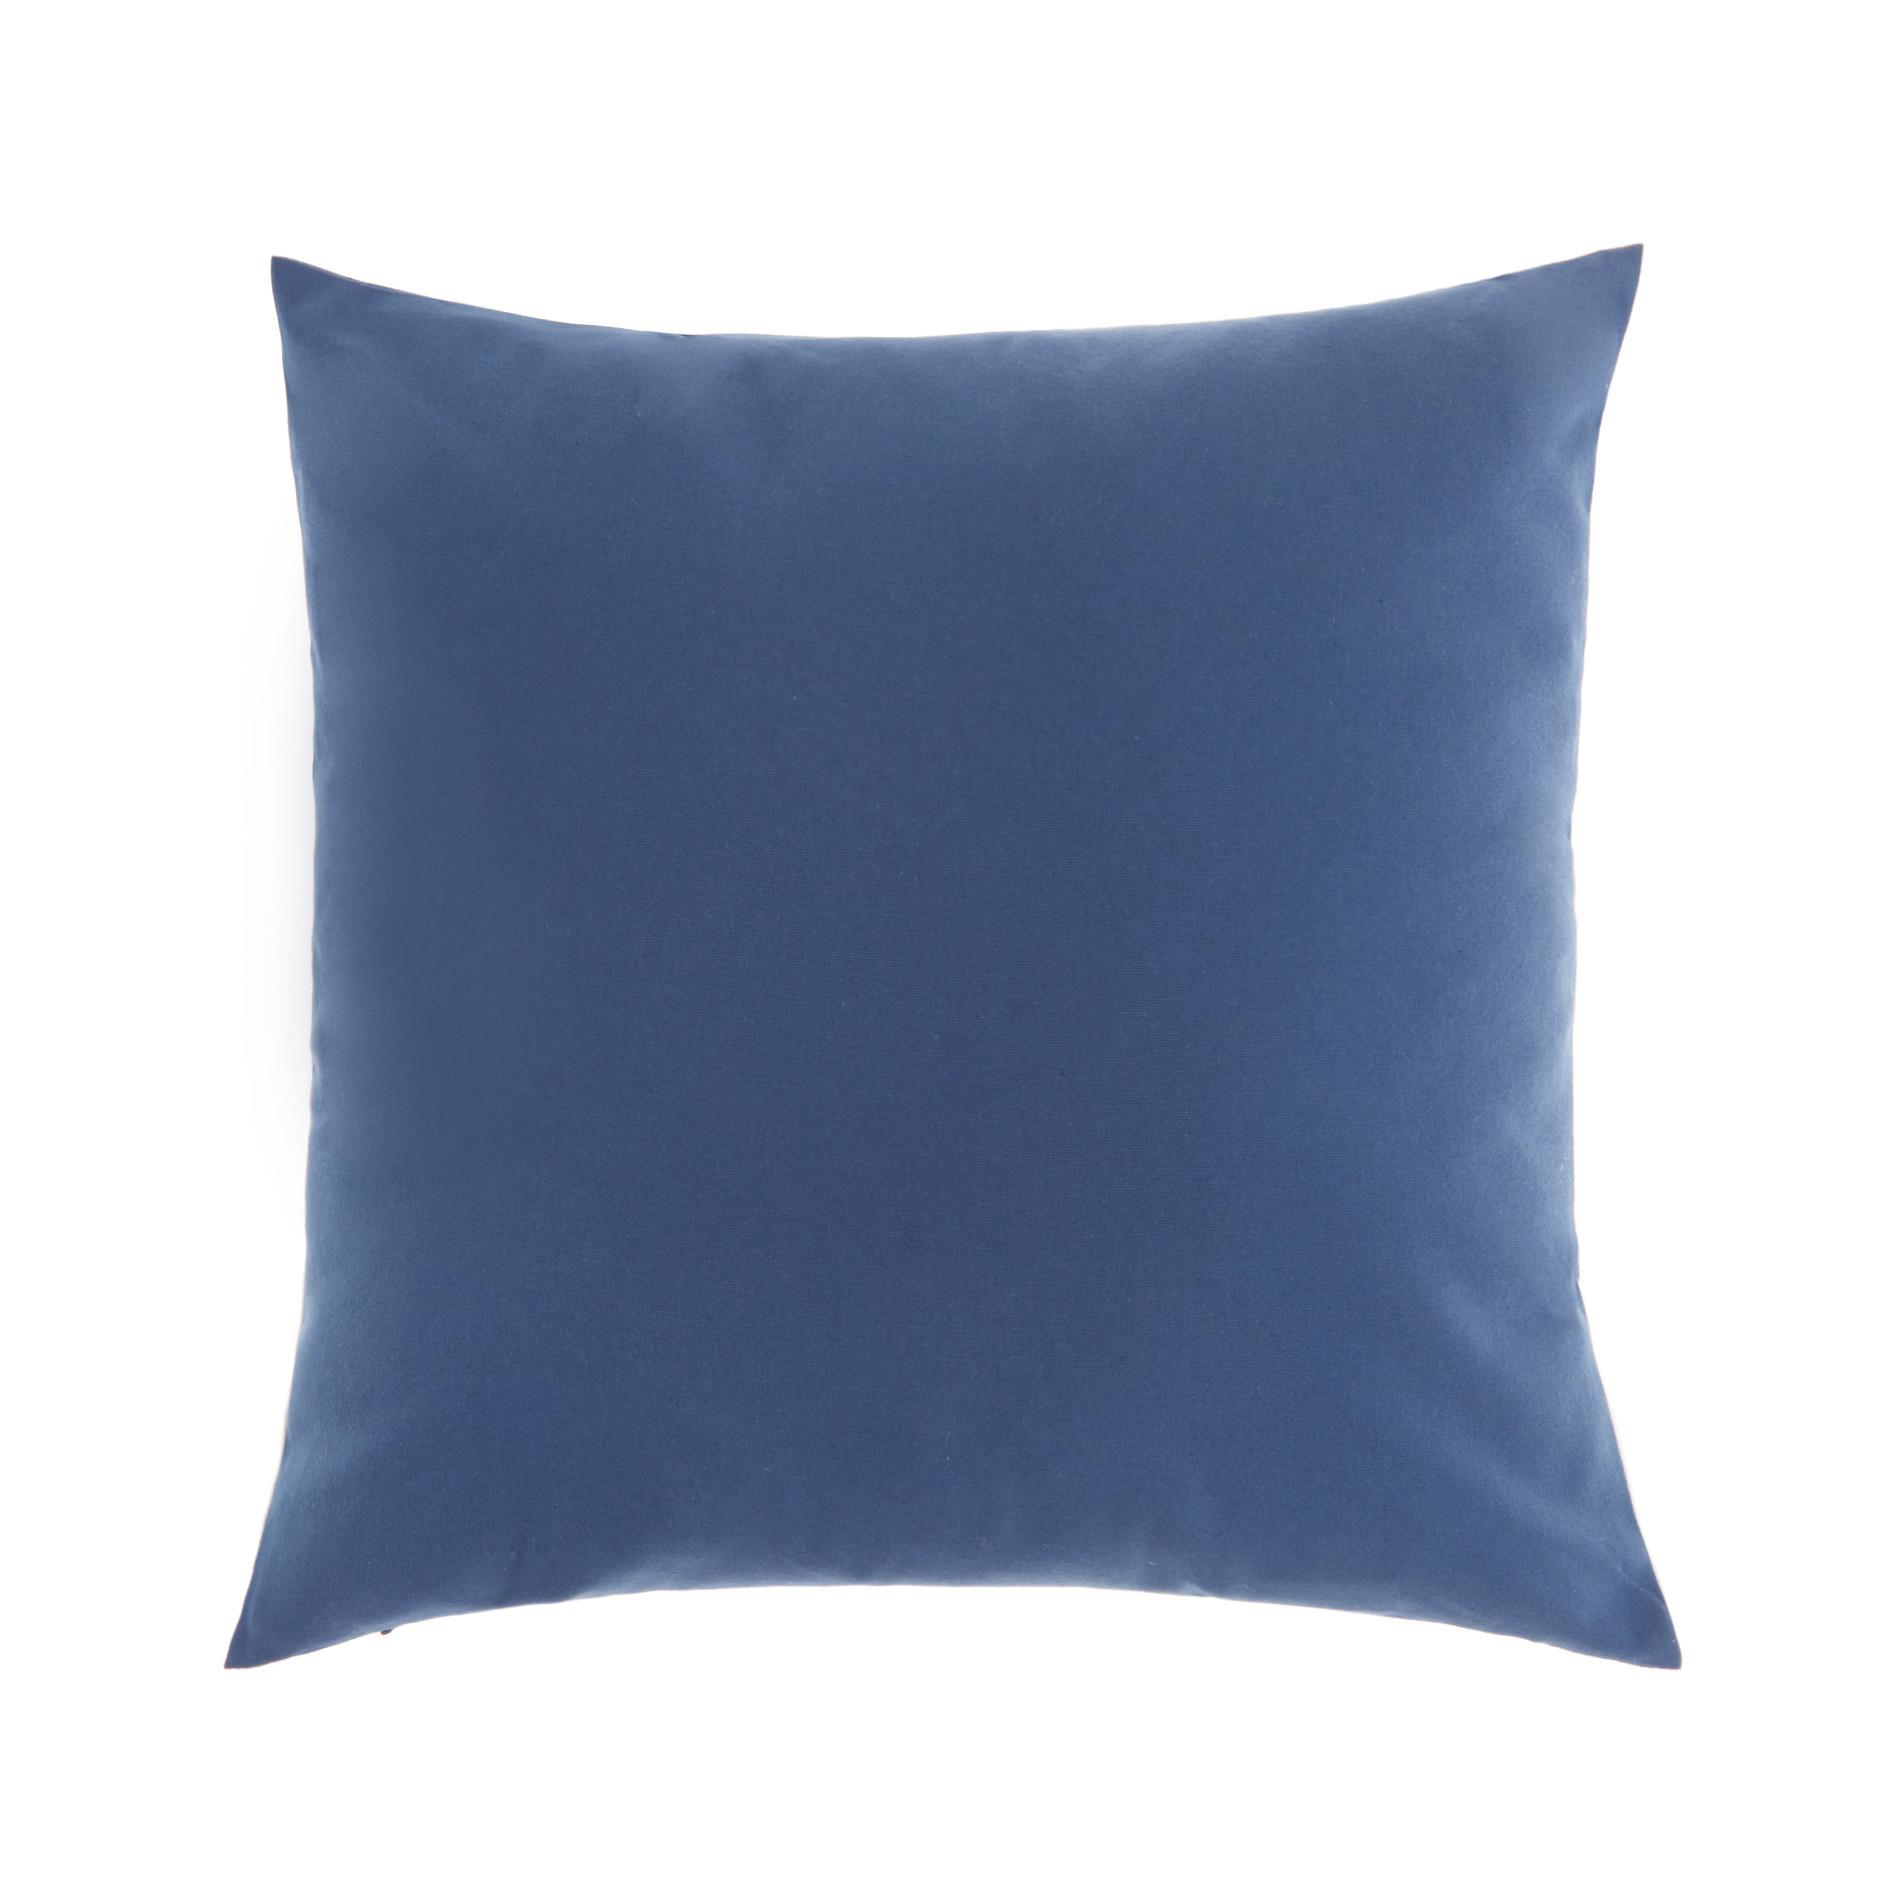 Cuscino ricamo conchiglie 45x45cm, Blu, large image number 2